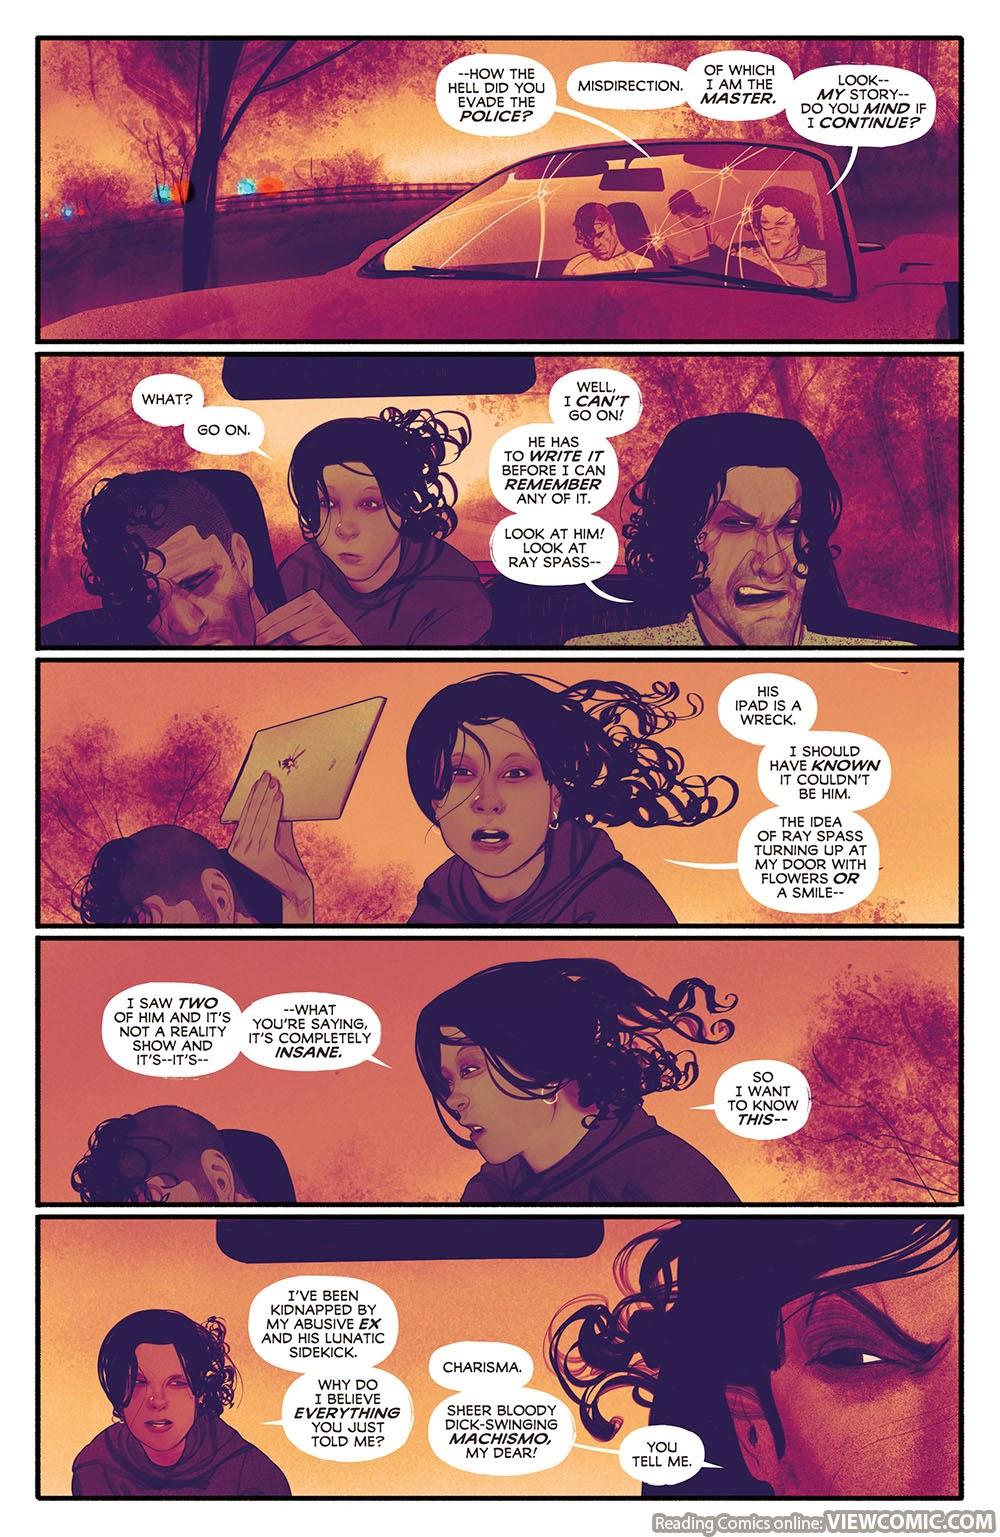 Annihilator 004 (2015) ……………………………… | Viewcomic reading comics online for  free 2019